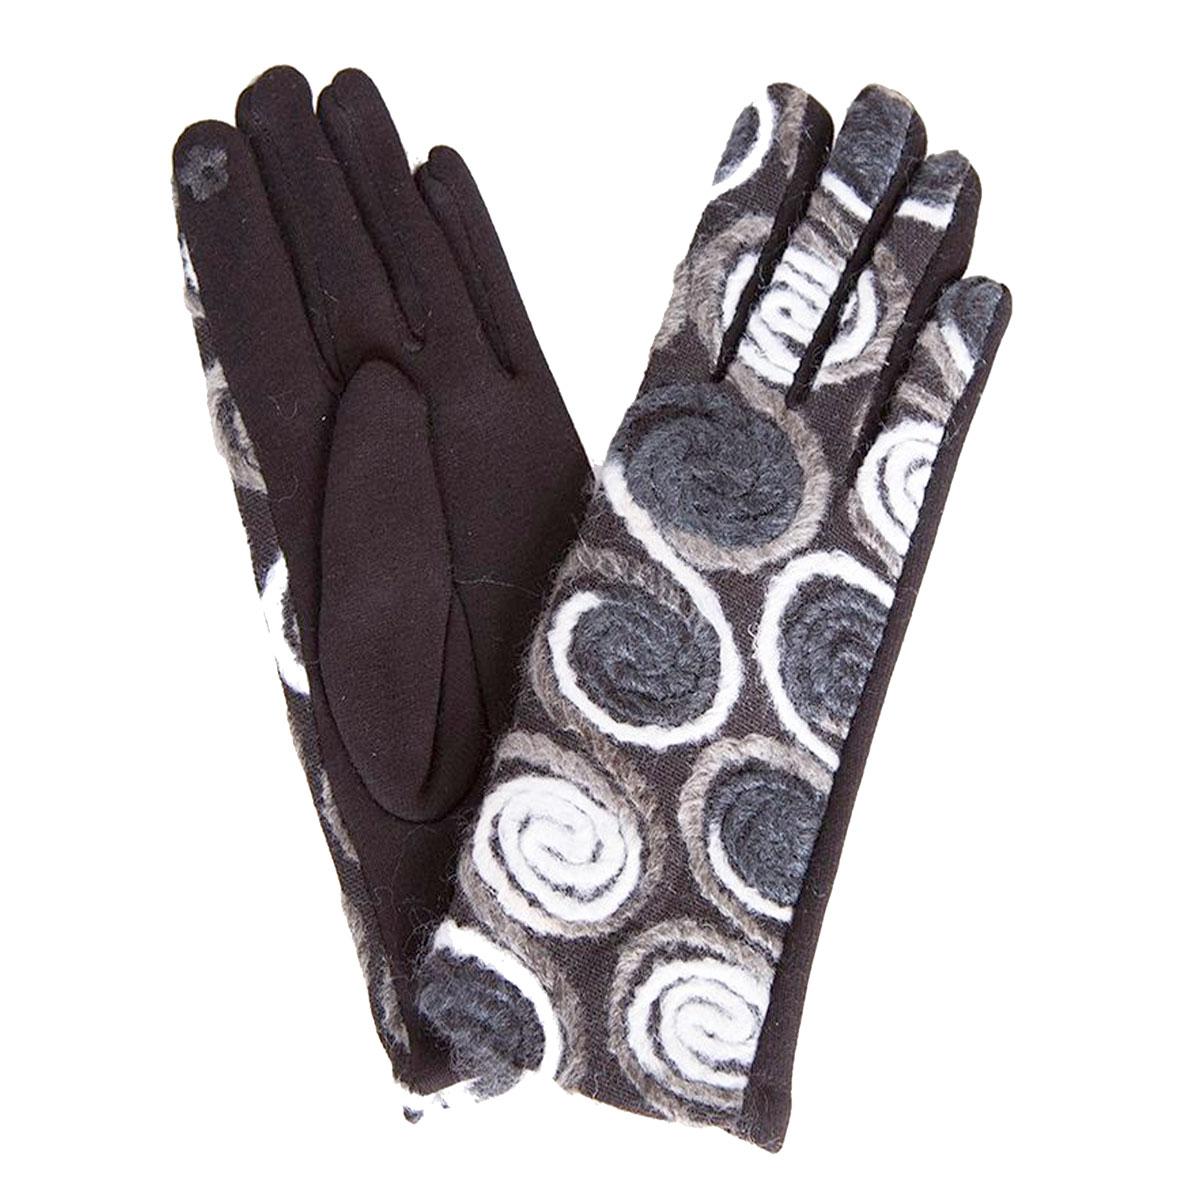 Touch Screen Smart Gloves - Fleece Lined  843-MU Spiral Yarn Mustard - One Size